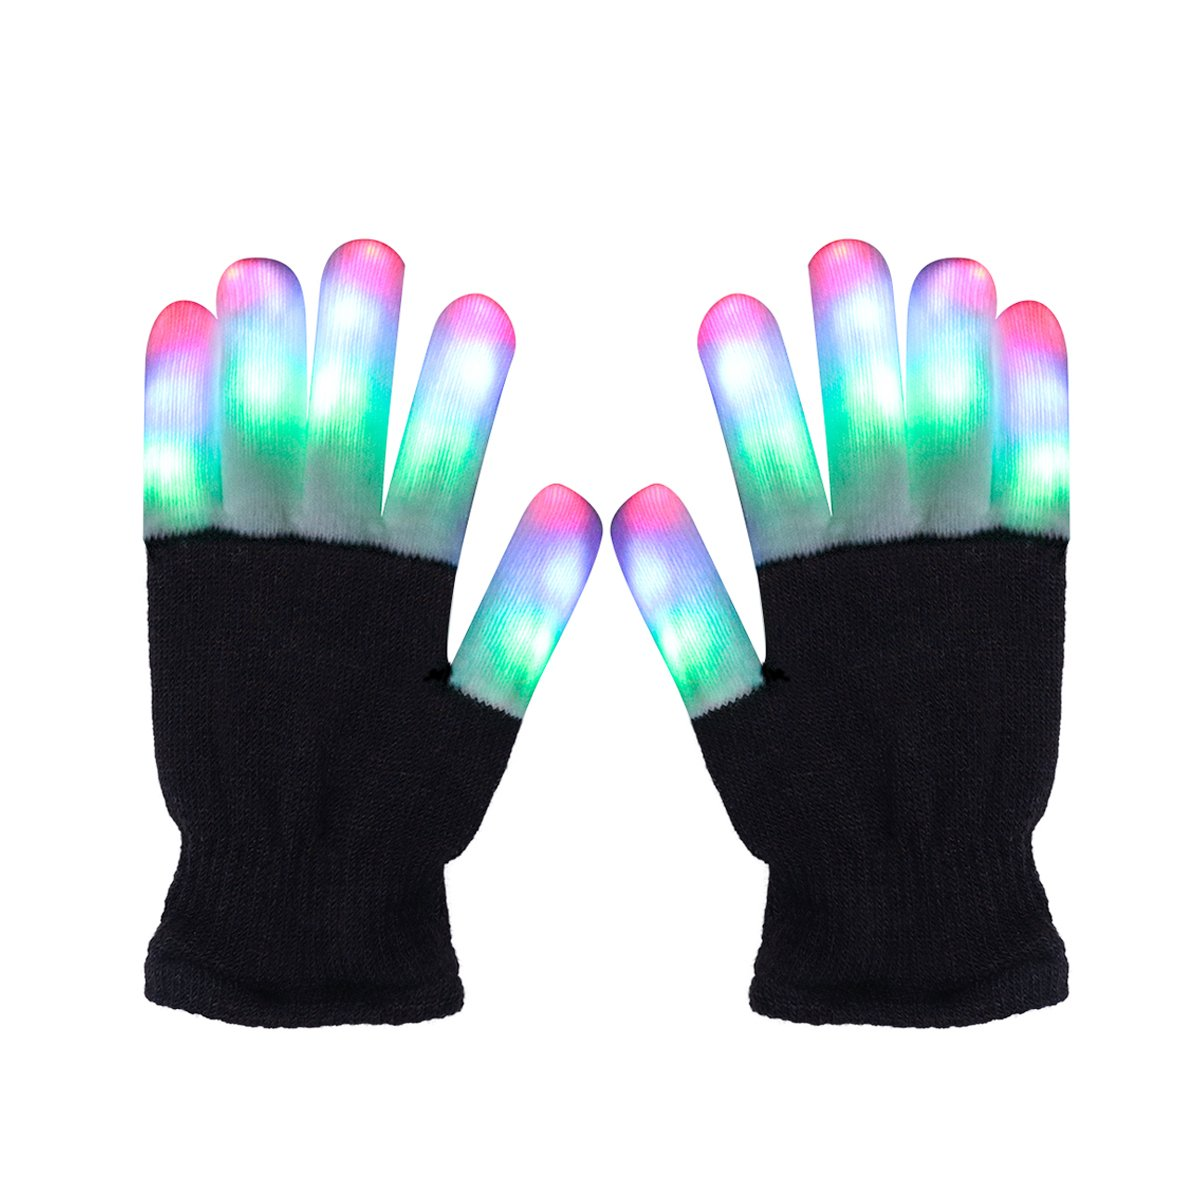 LED Gloves Light Up Rave Gloves Finger Light Gloves Novelty Toy 6 Adjust Mode